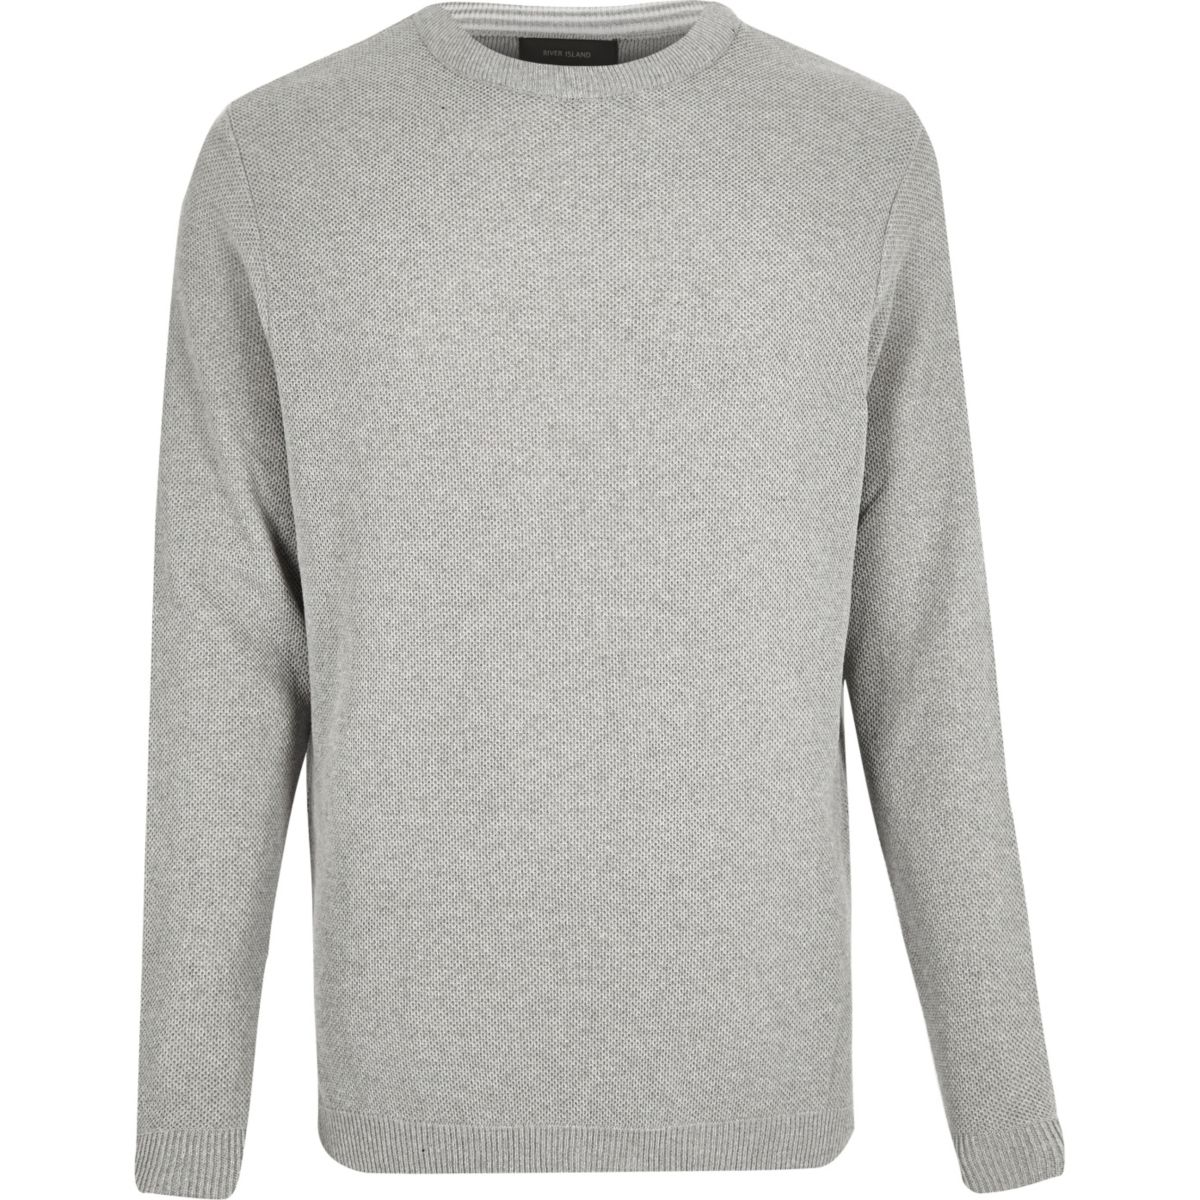 Grey textured sweater